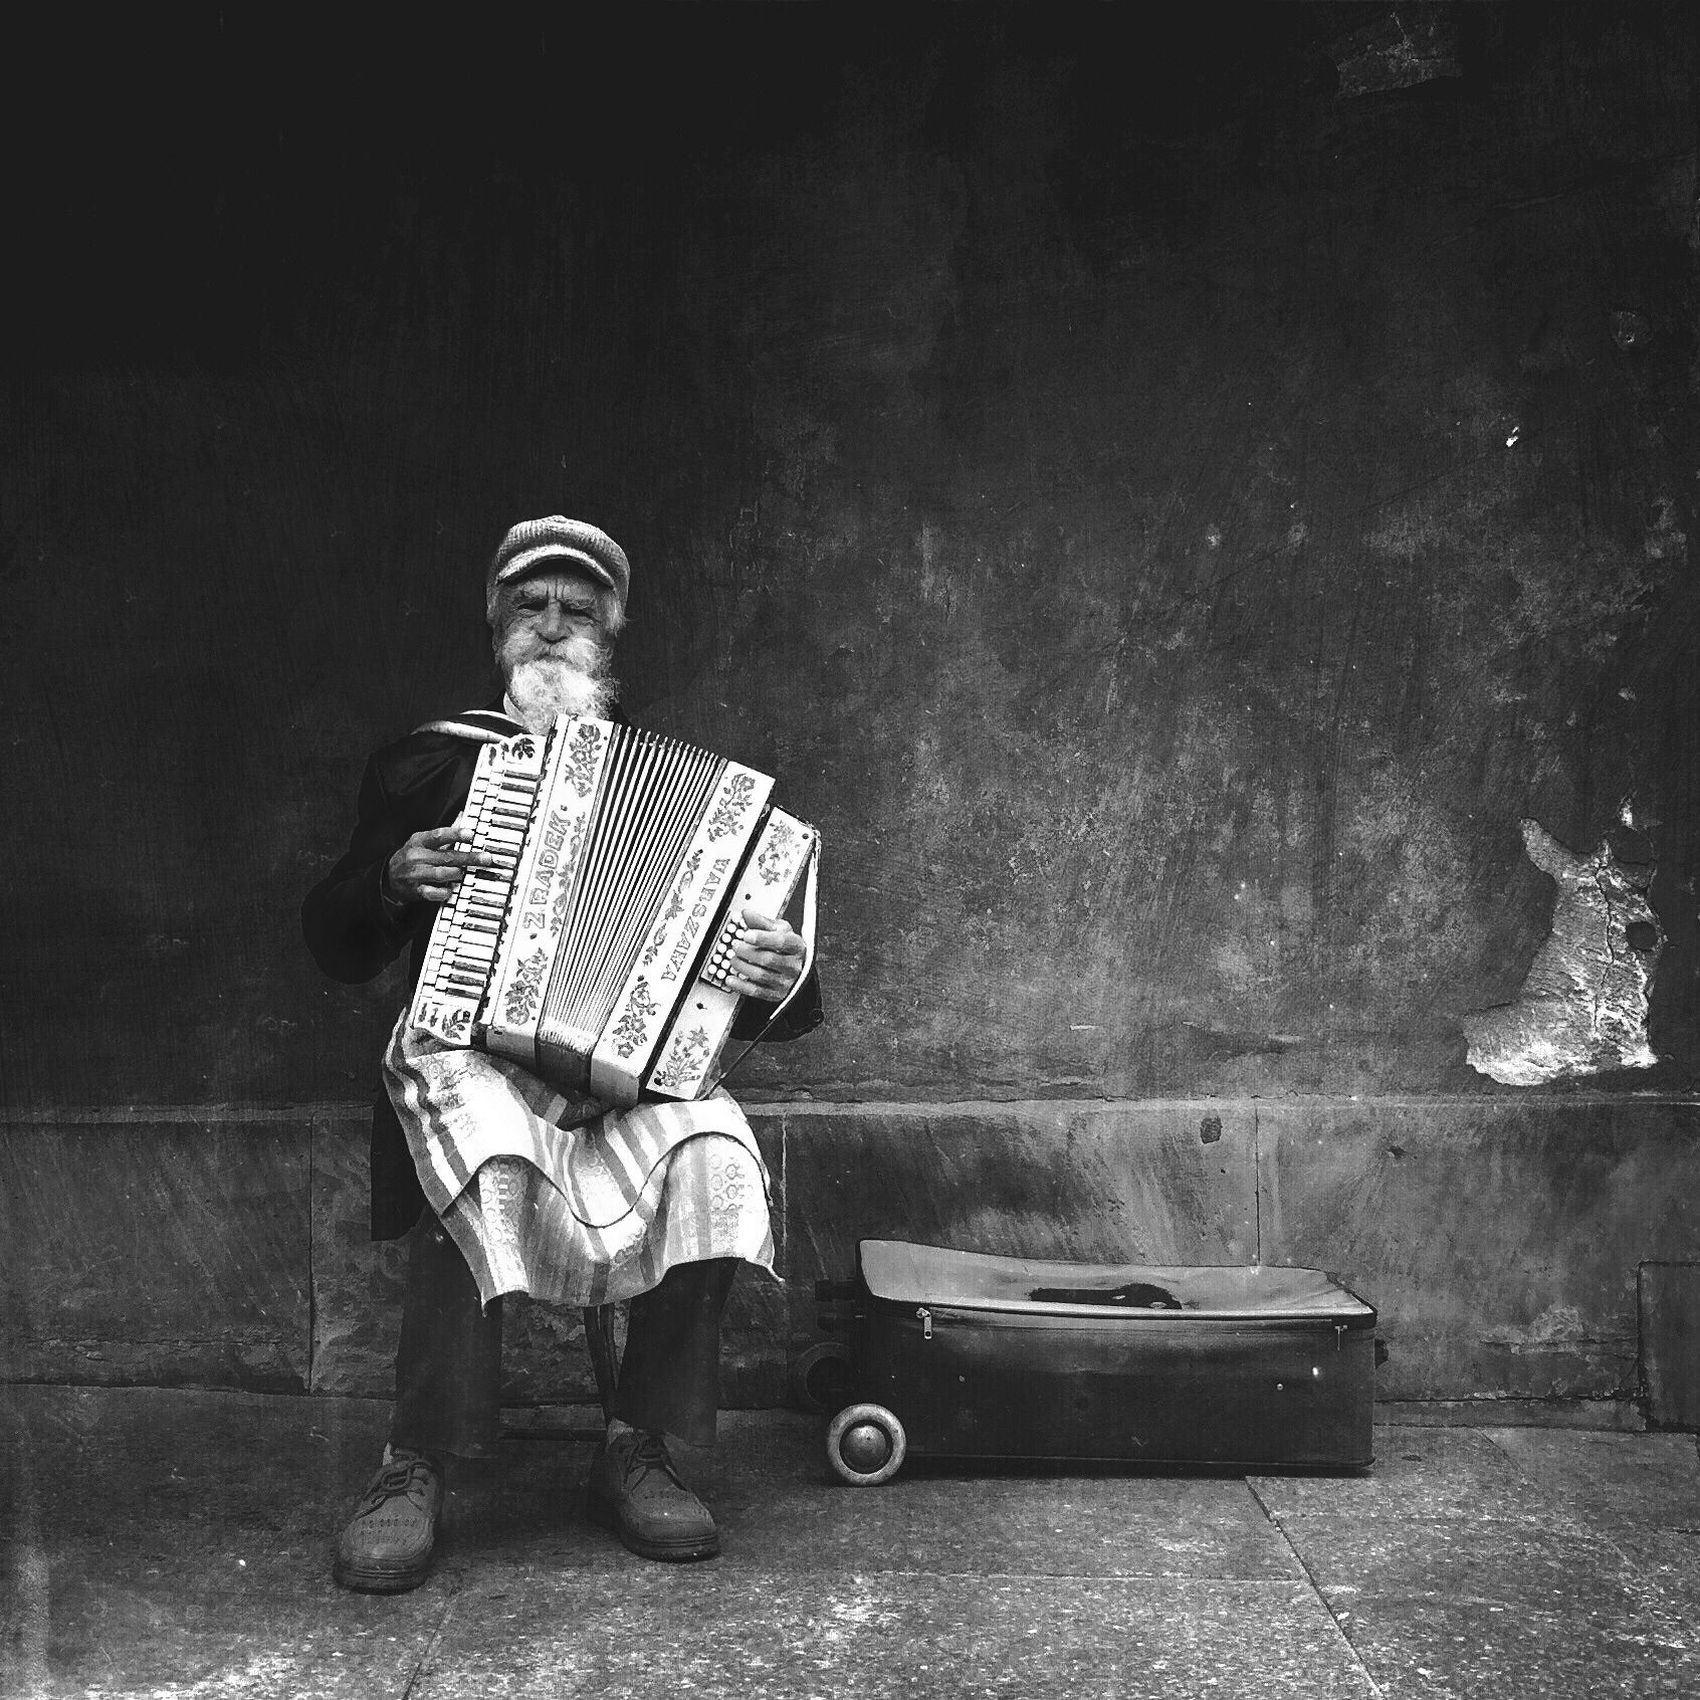 Michal Koralewski 1stplace  photographer of the year